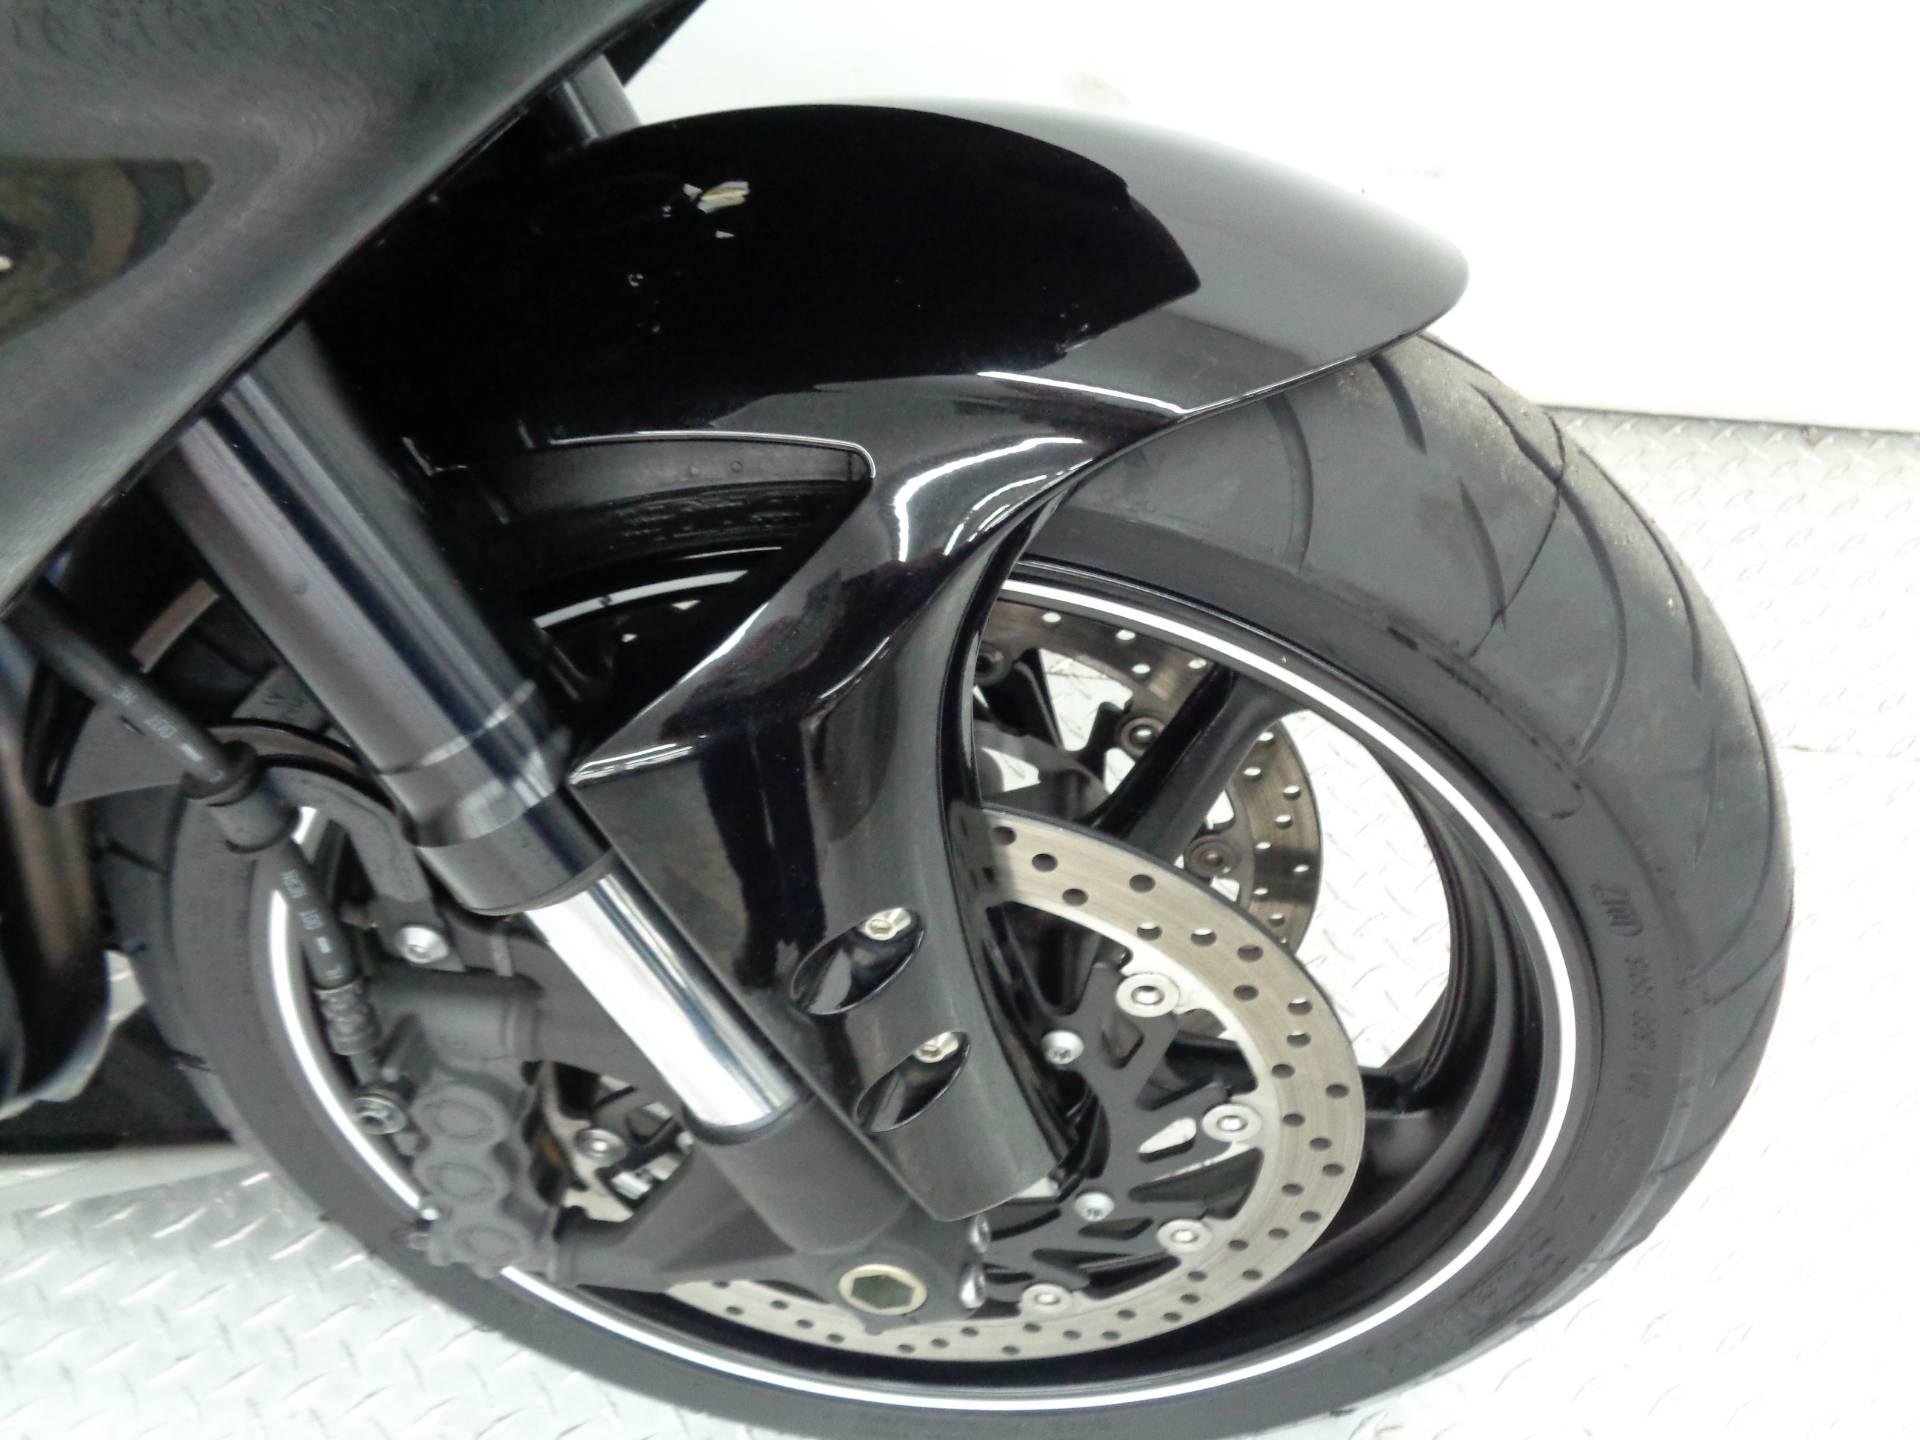 2010 Yamaha YZF-R1 8